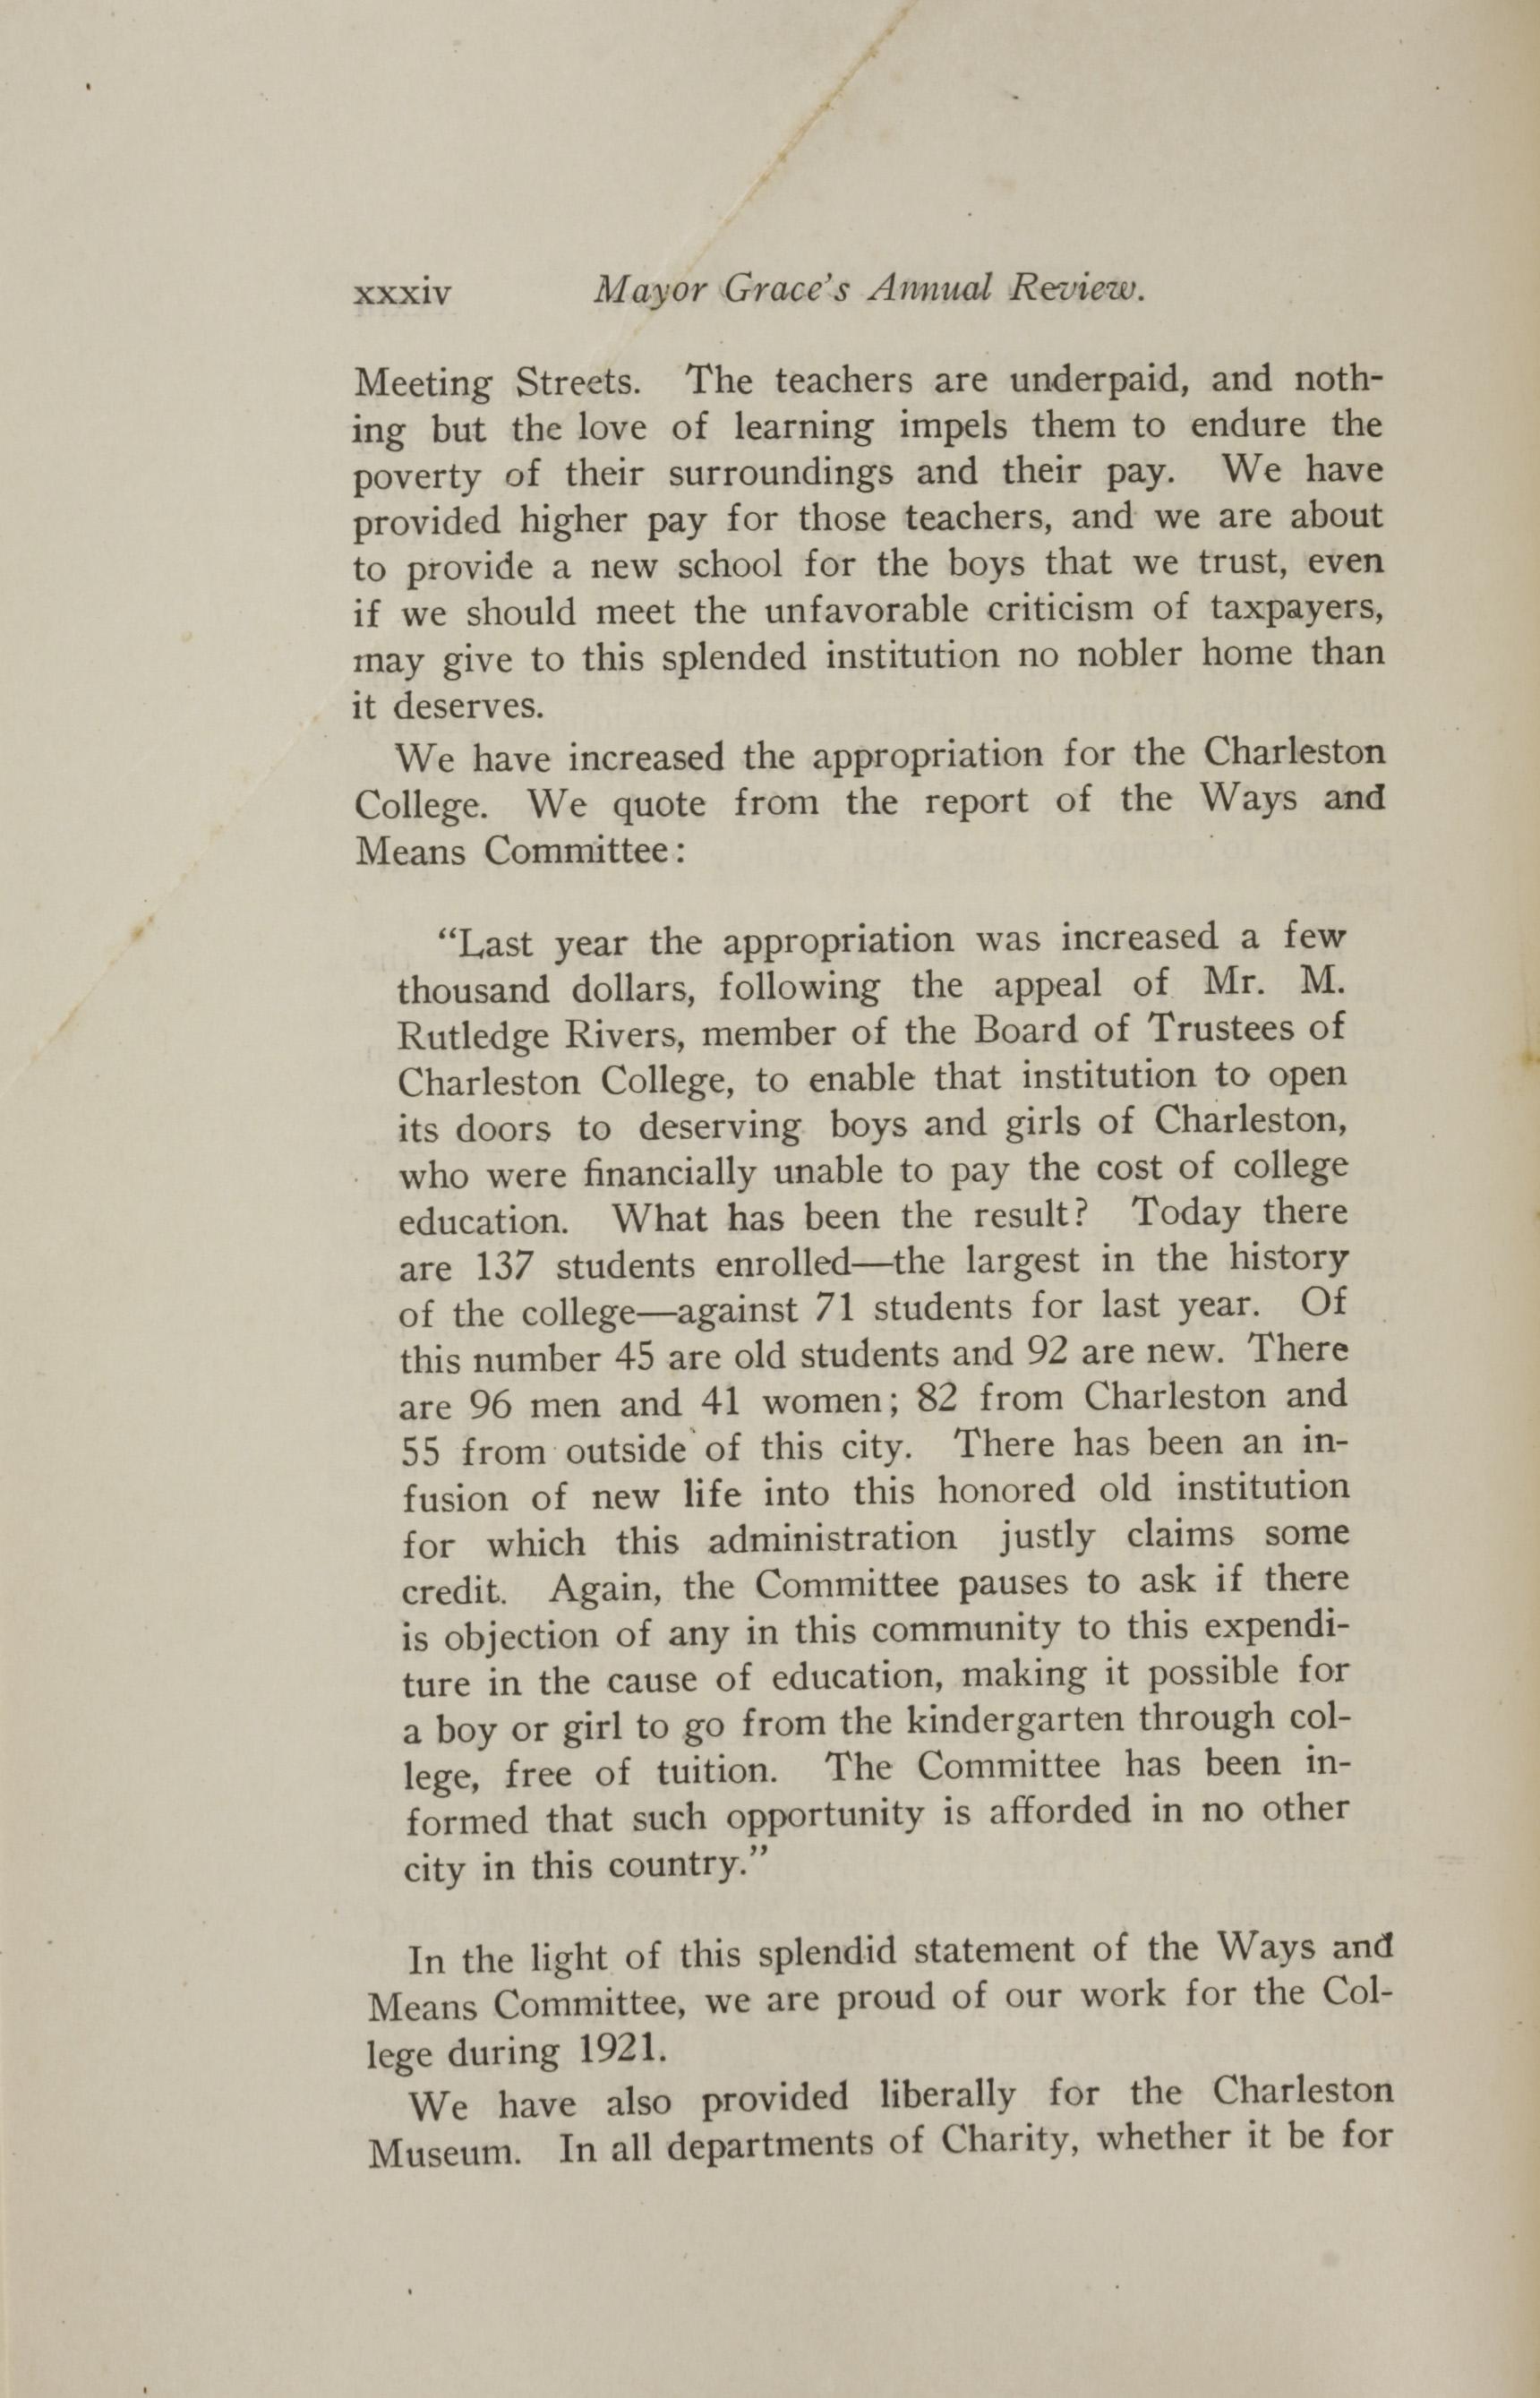 Charleston Yearbook, 1921, page xxxiv